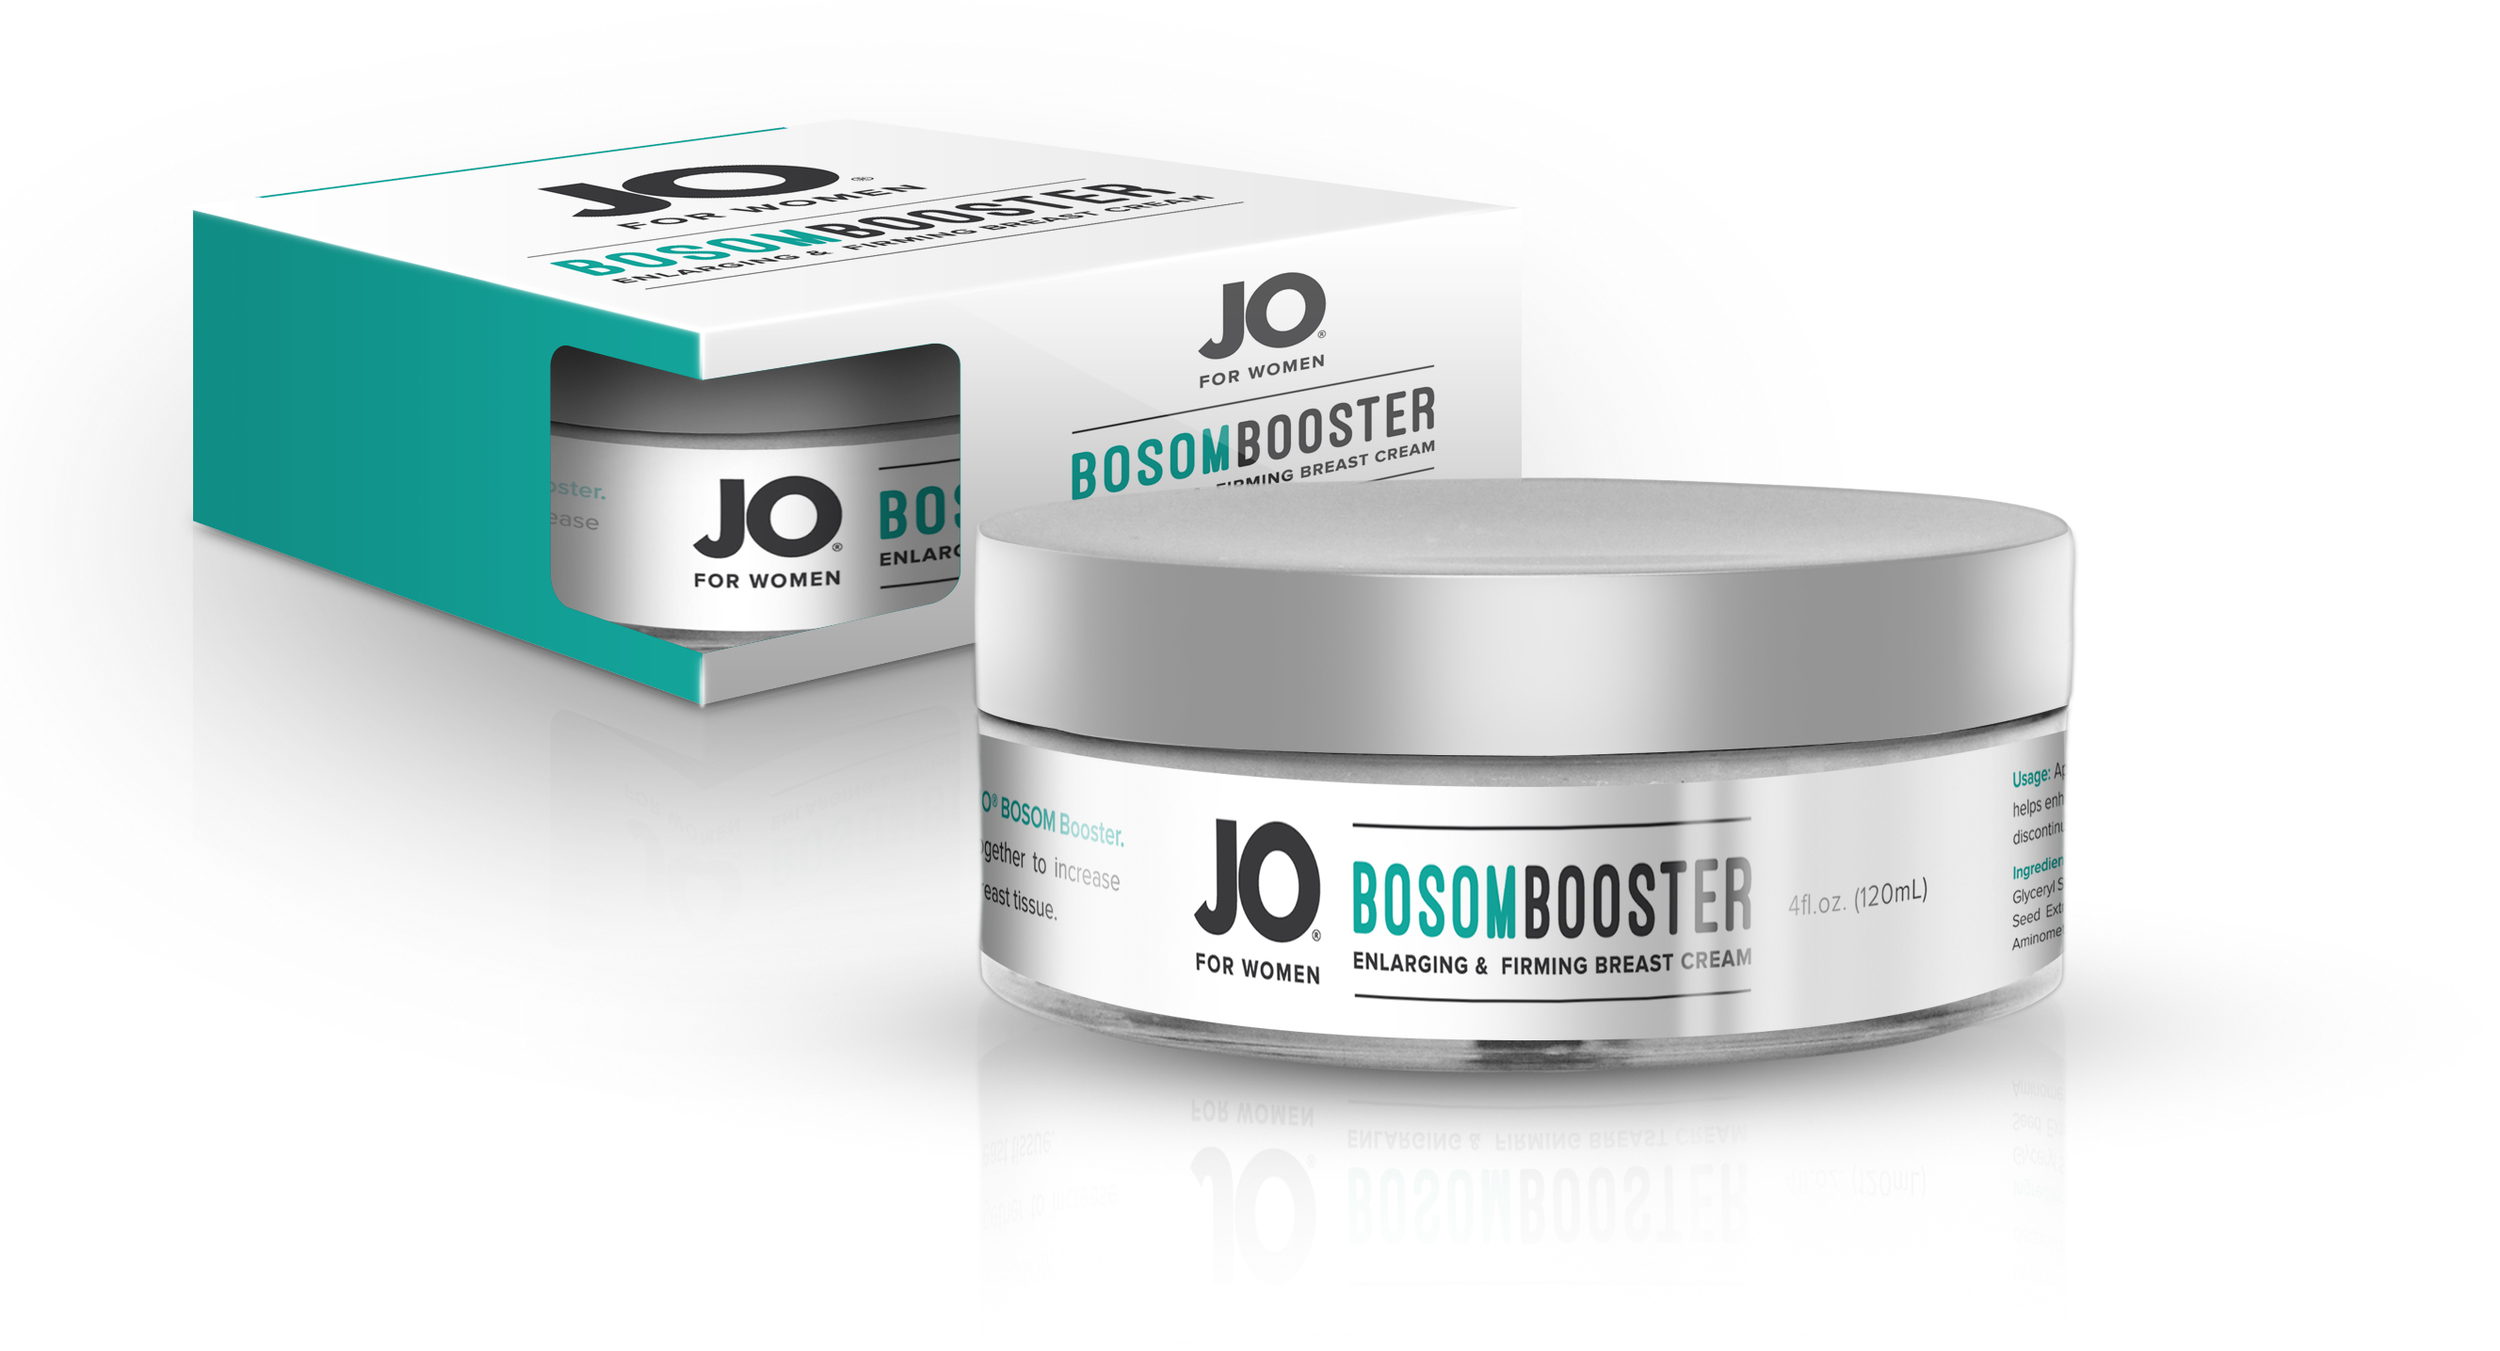 40450_JO_bosom_booster_4oz_all.jpg